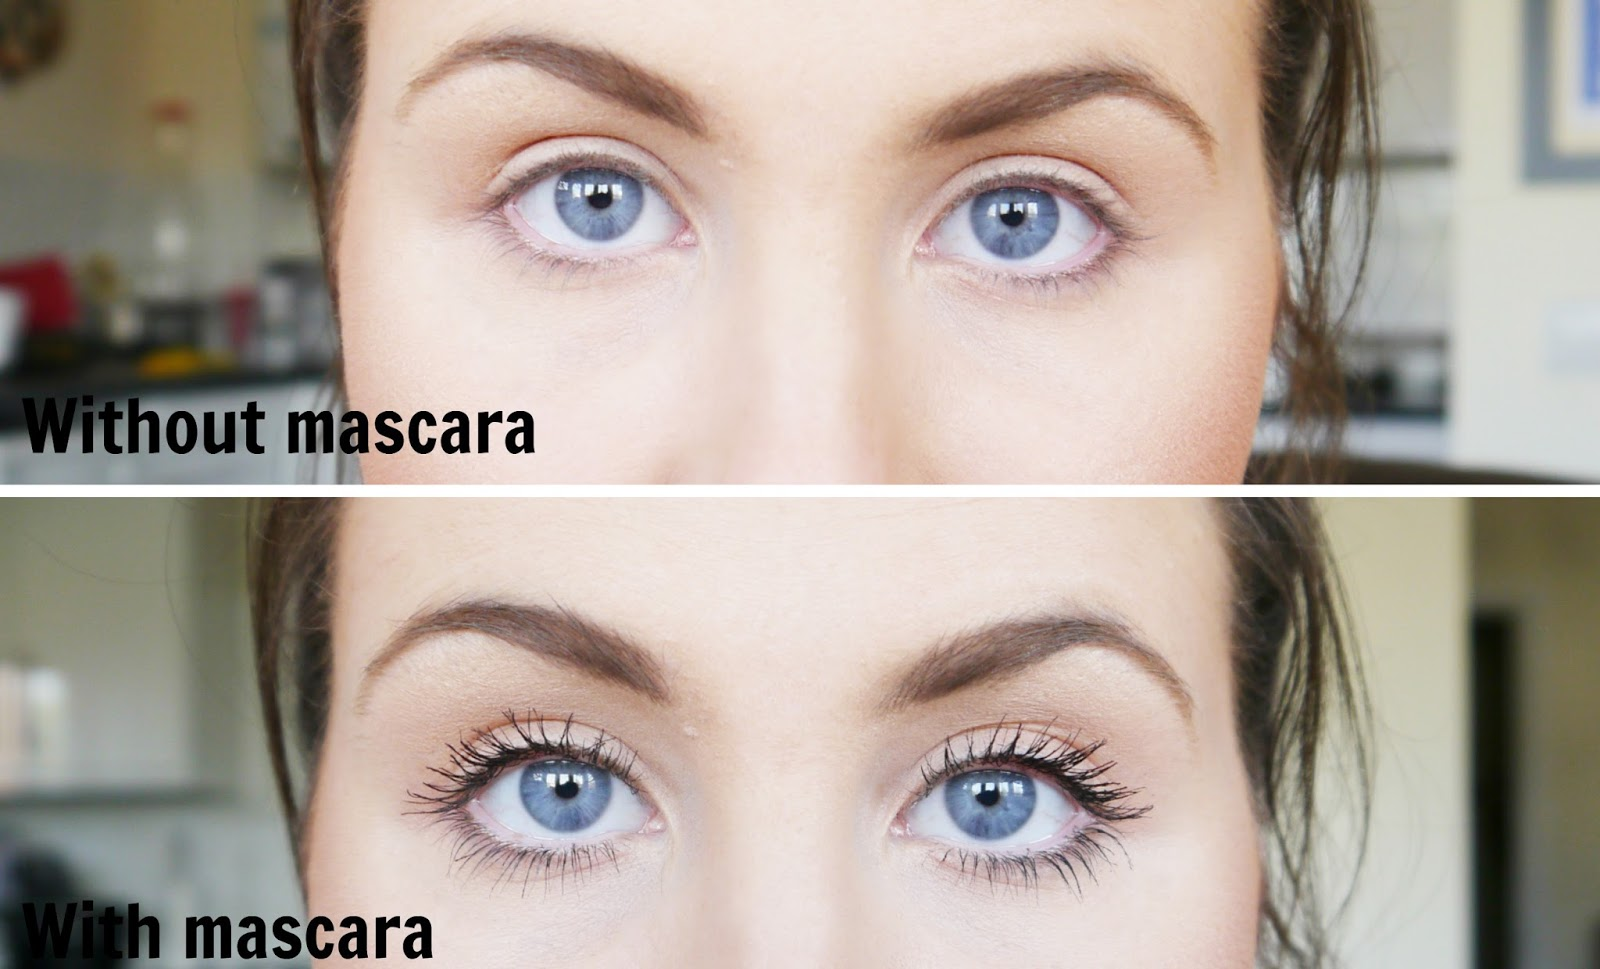 JessiejaneRevlon Review Its Length Mascara Super 1c3TulKFJ